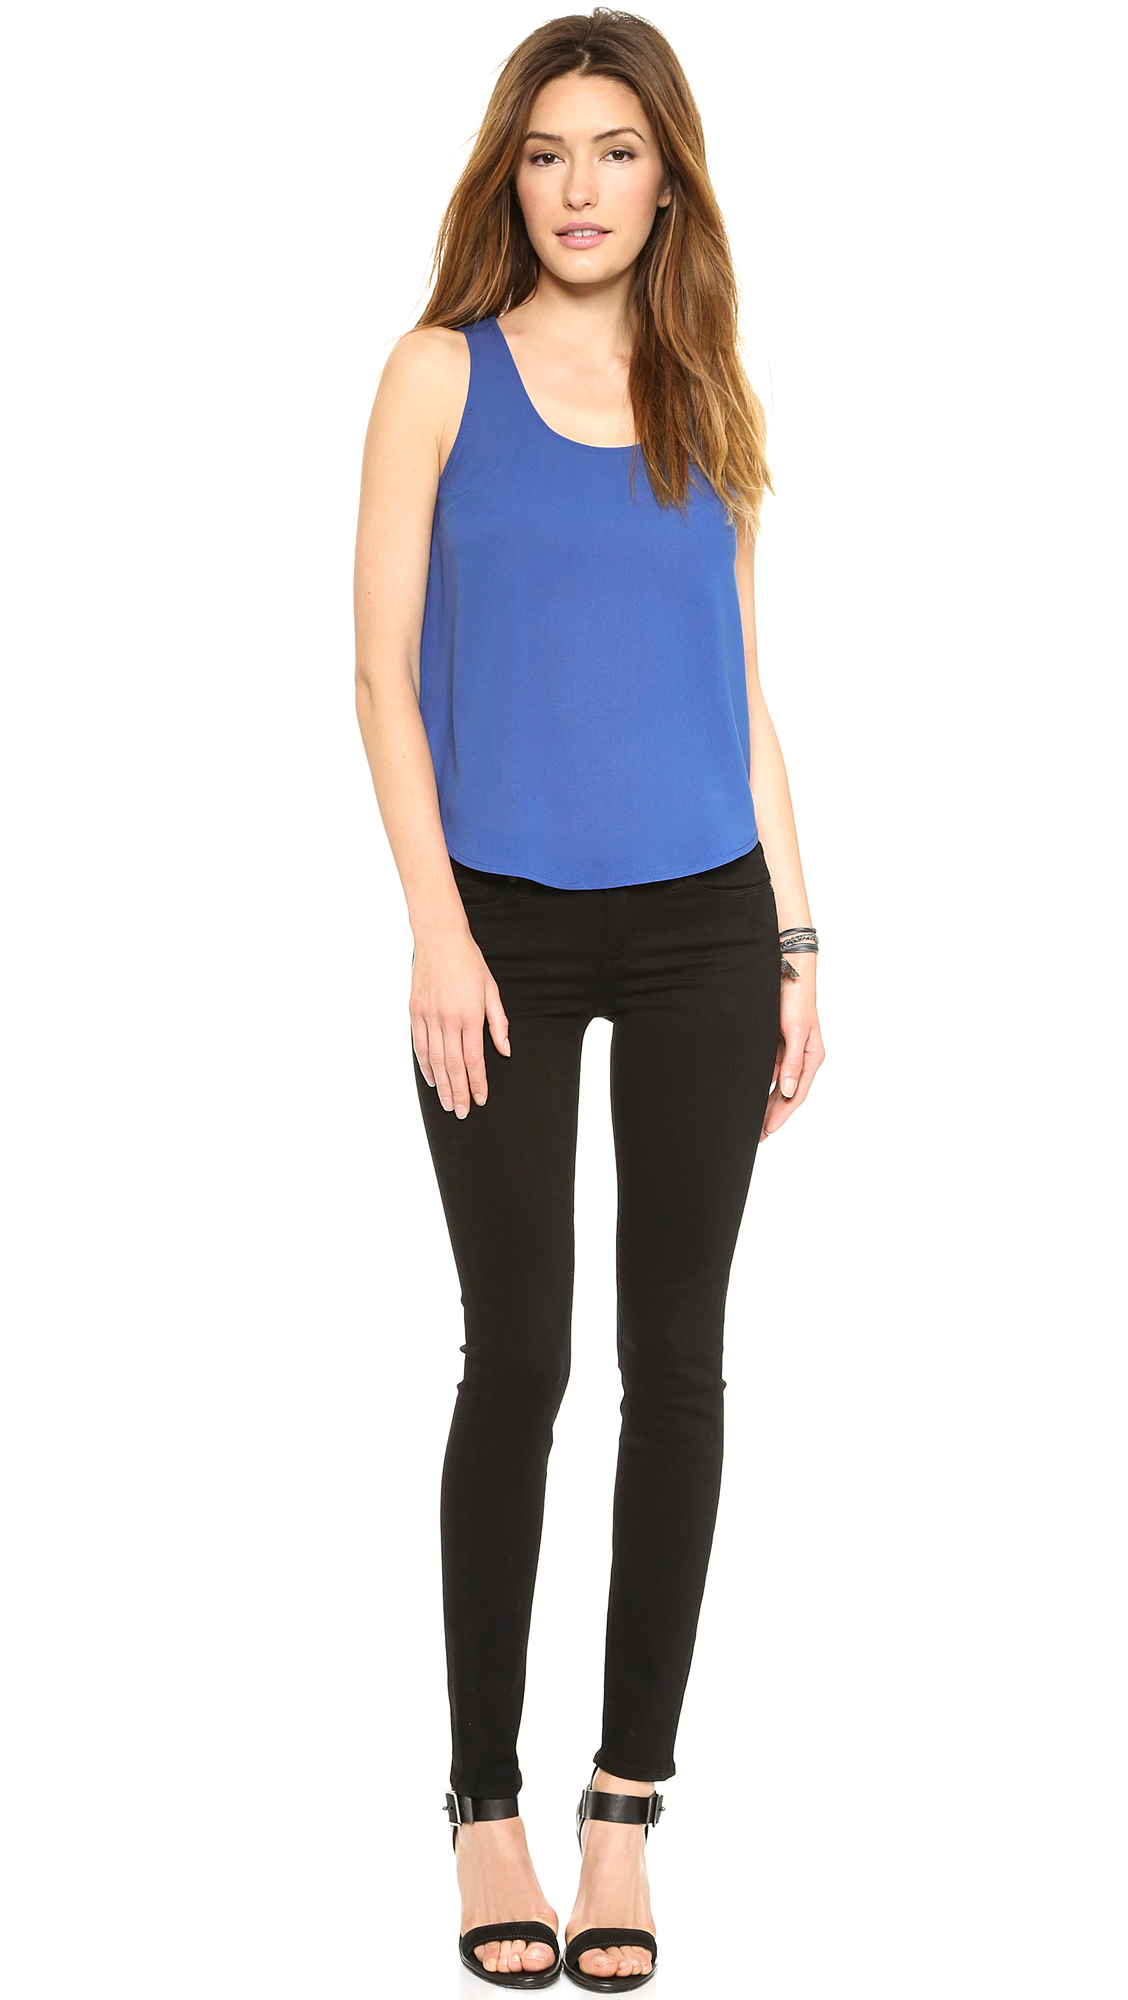 Paige Denim Verdugo Ultra Skinny Jeans | SHOPBOP